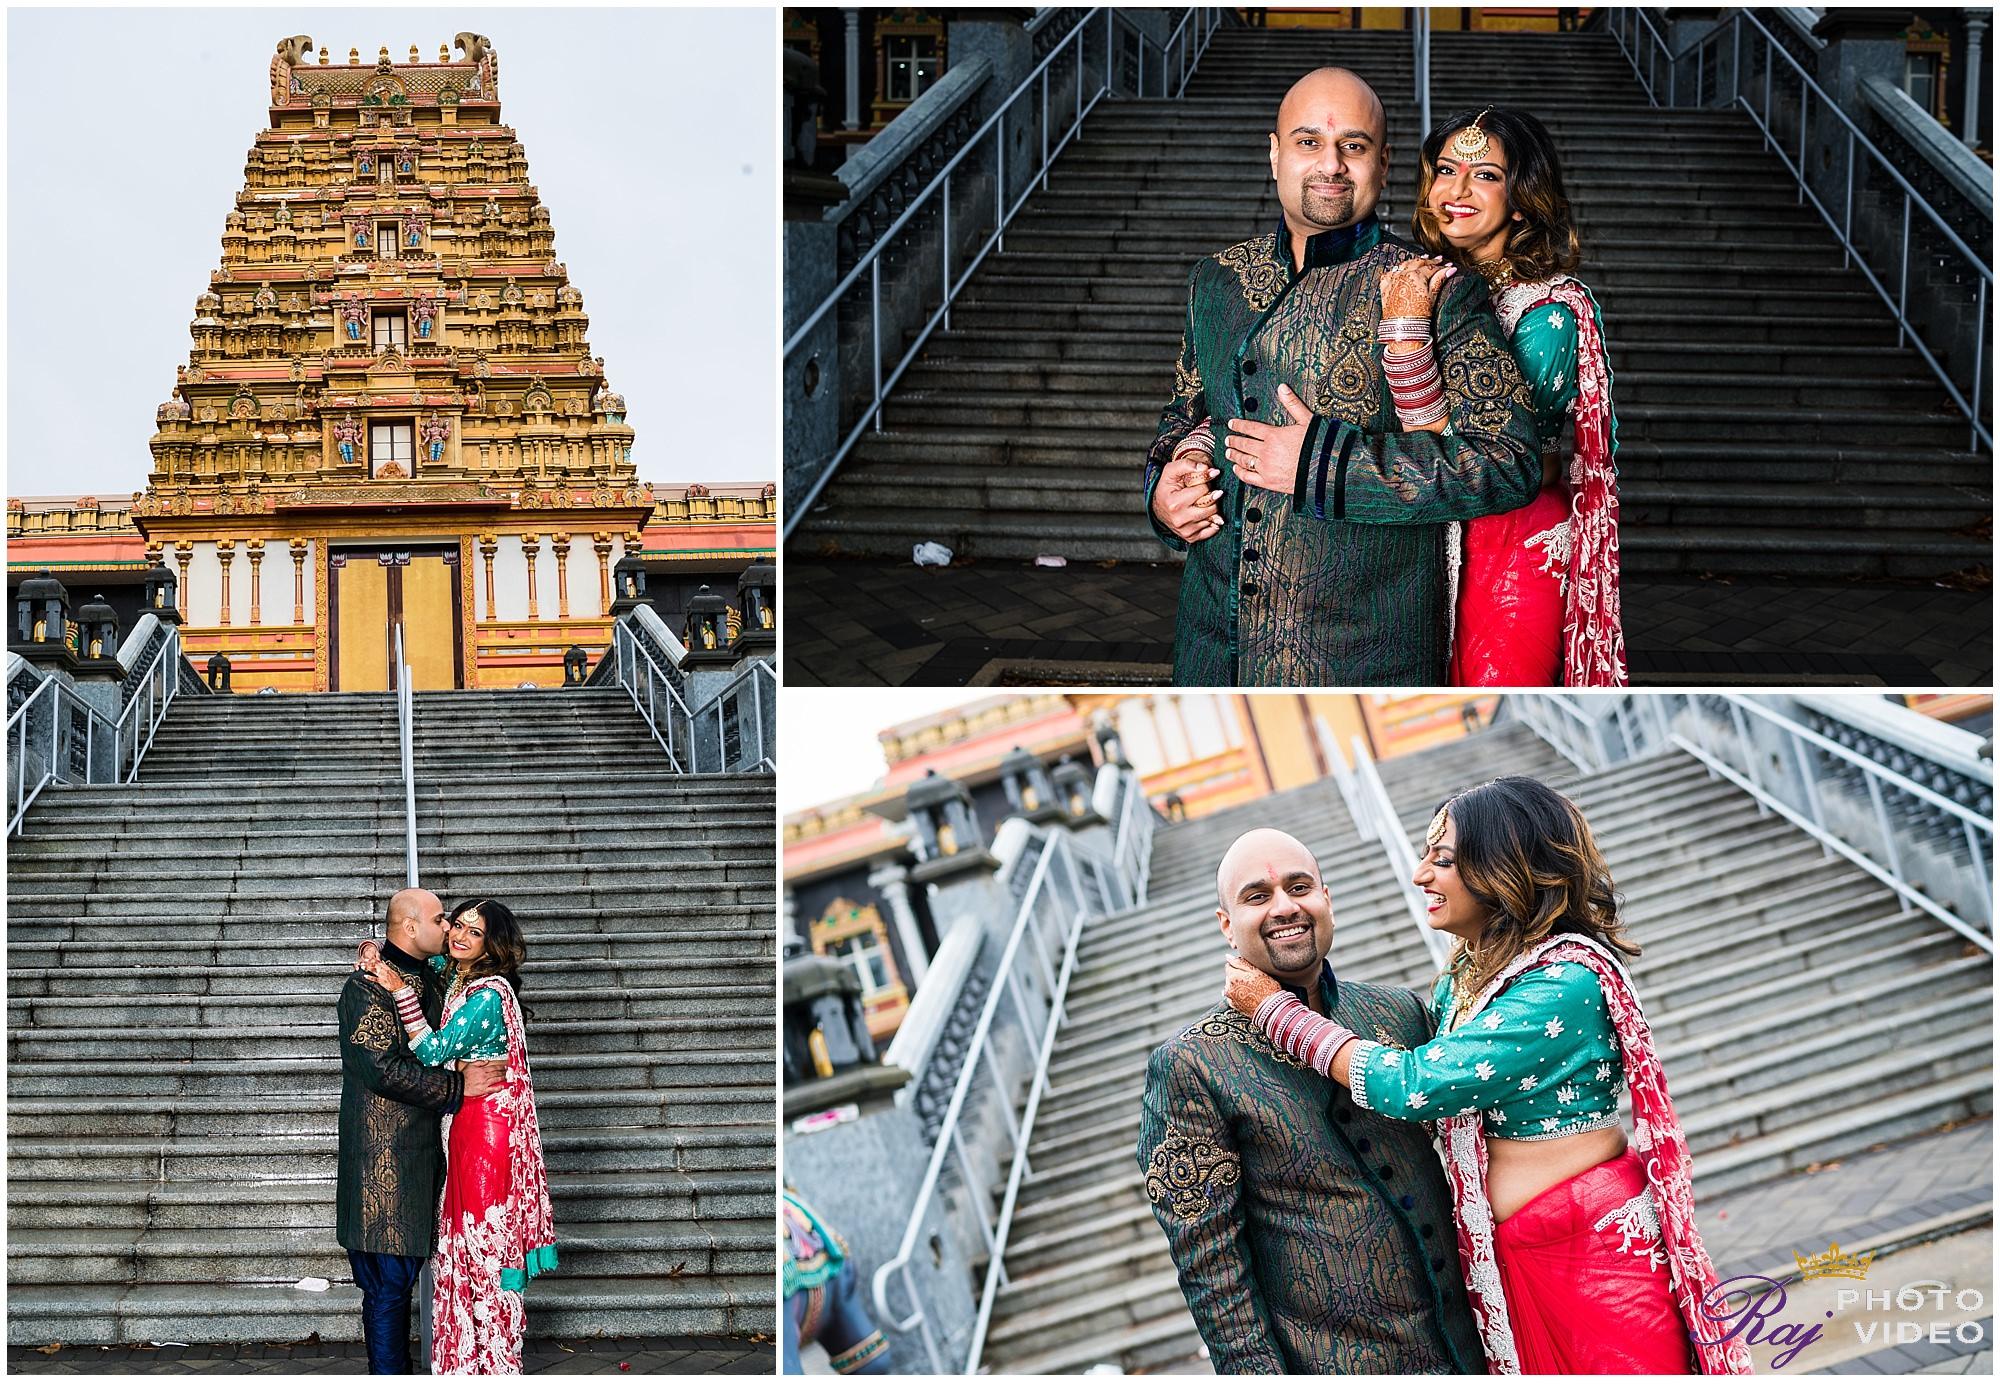 Sri-Guruvaayoorappan-Temple-Marlboro-NJ-Indian-Wedding-Chiyomi-Scott-00033.jpg